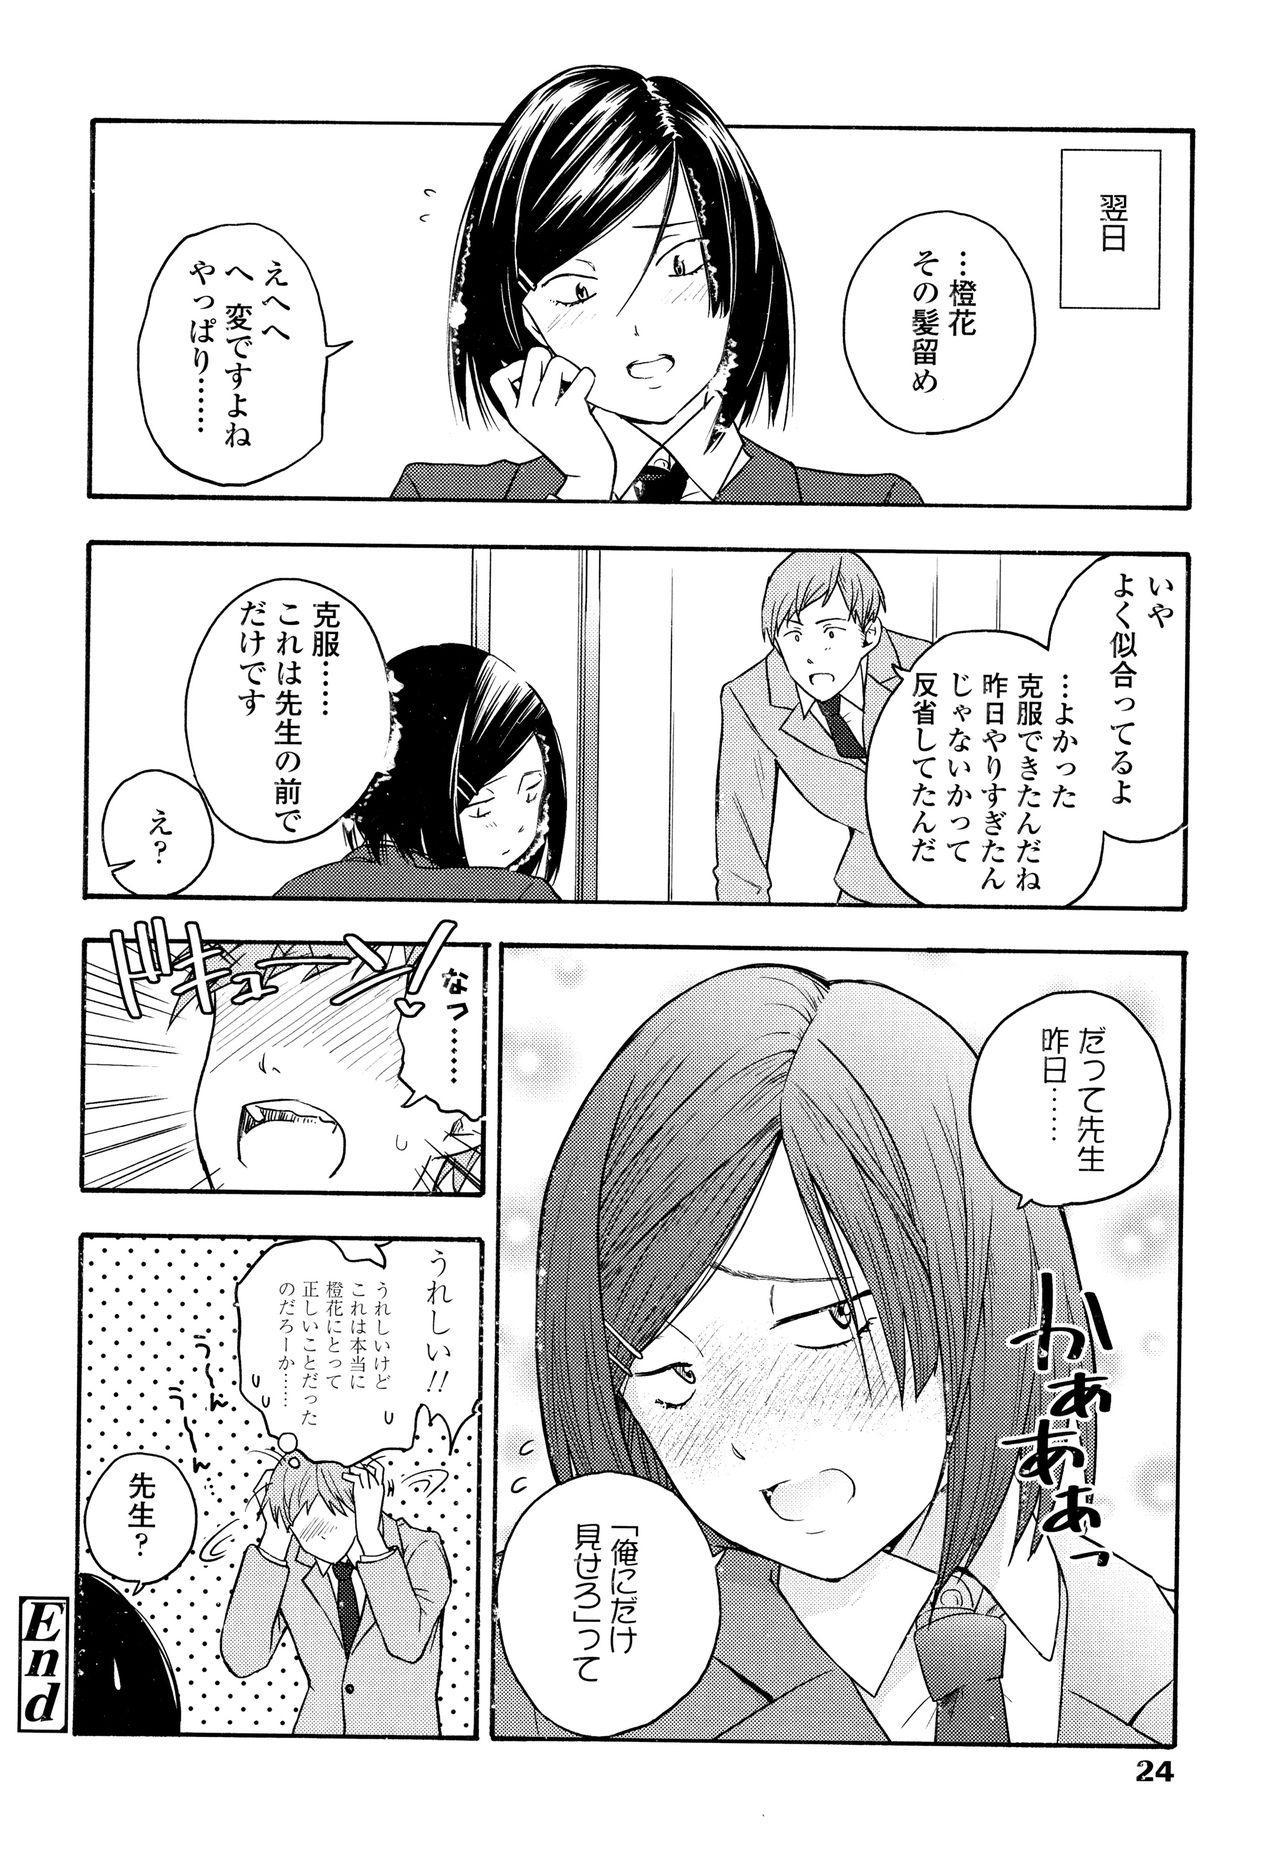 Shishunki no Eros - puberty eros 26